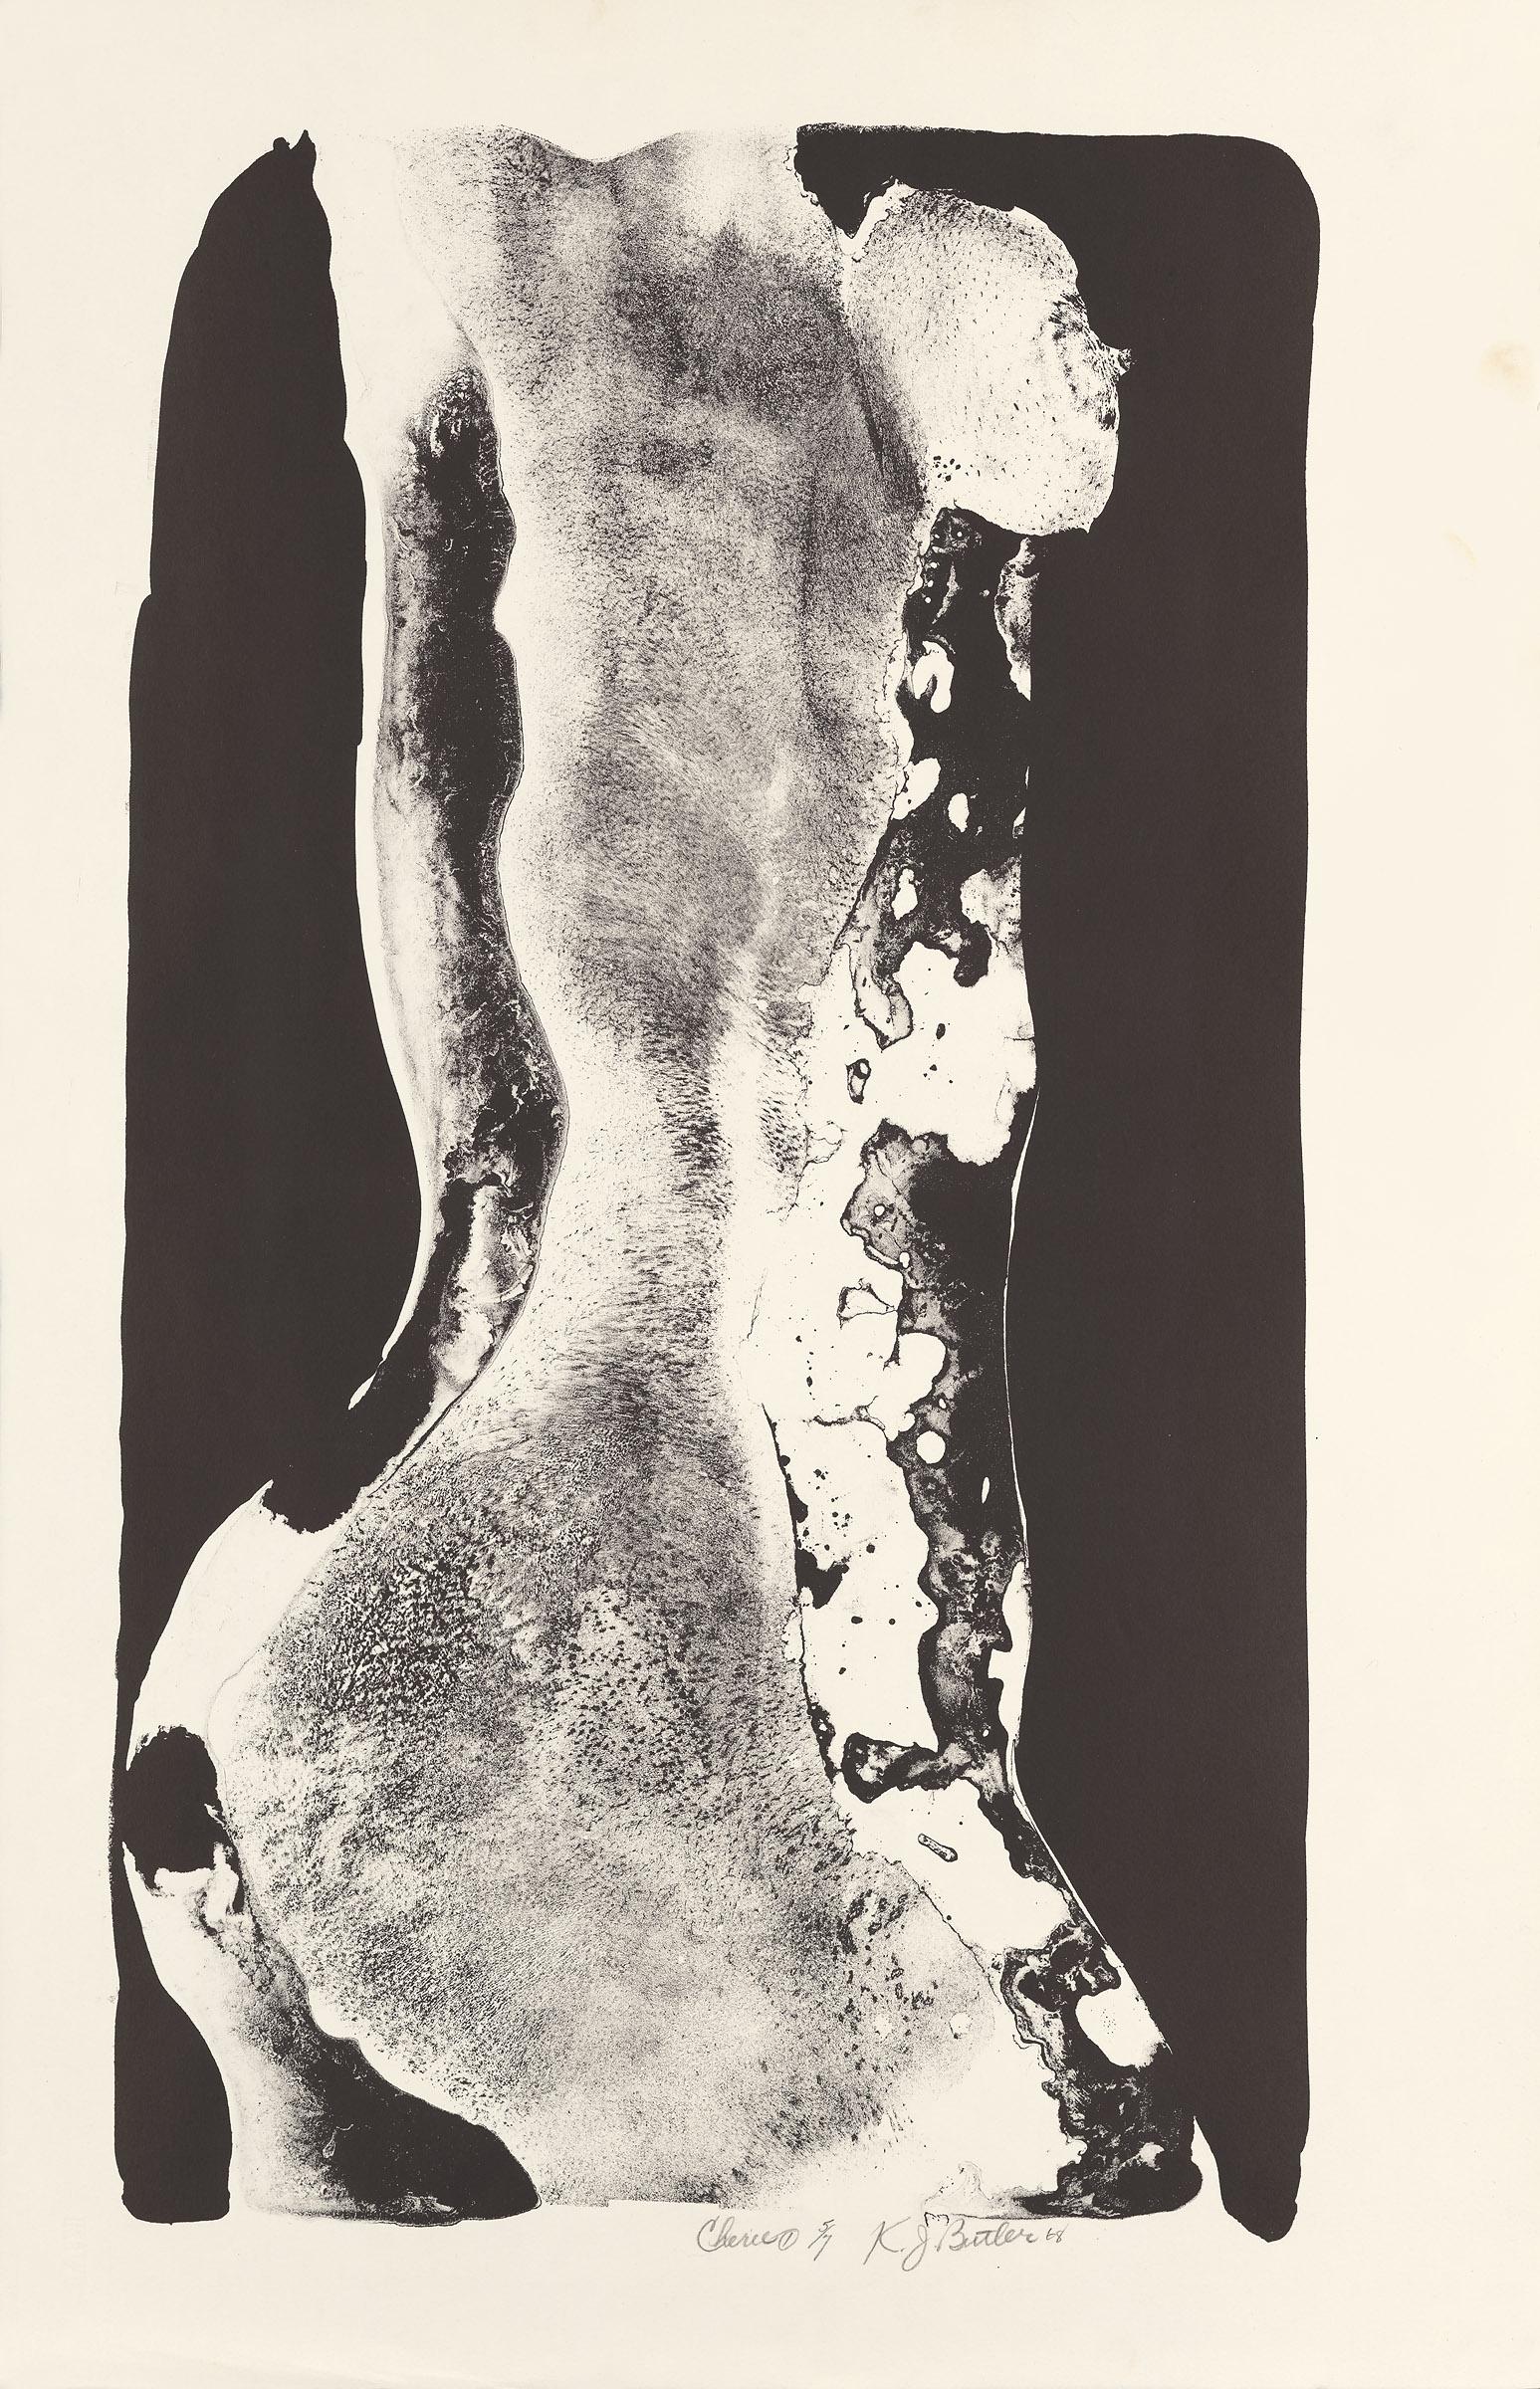 Cherie 1 , 1968 Lithograph, 5/7